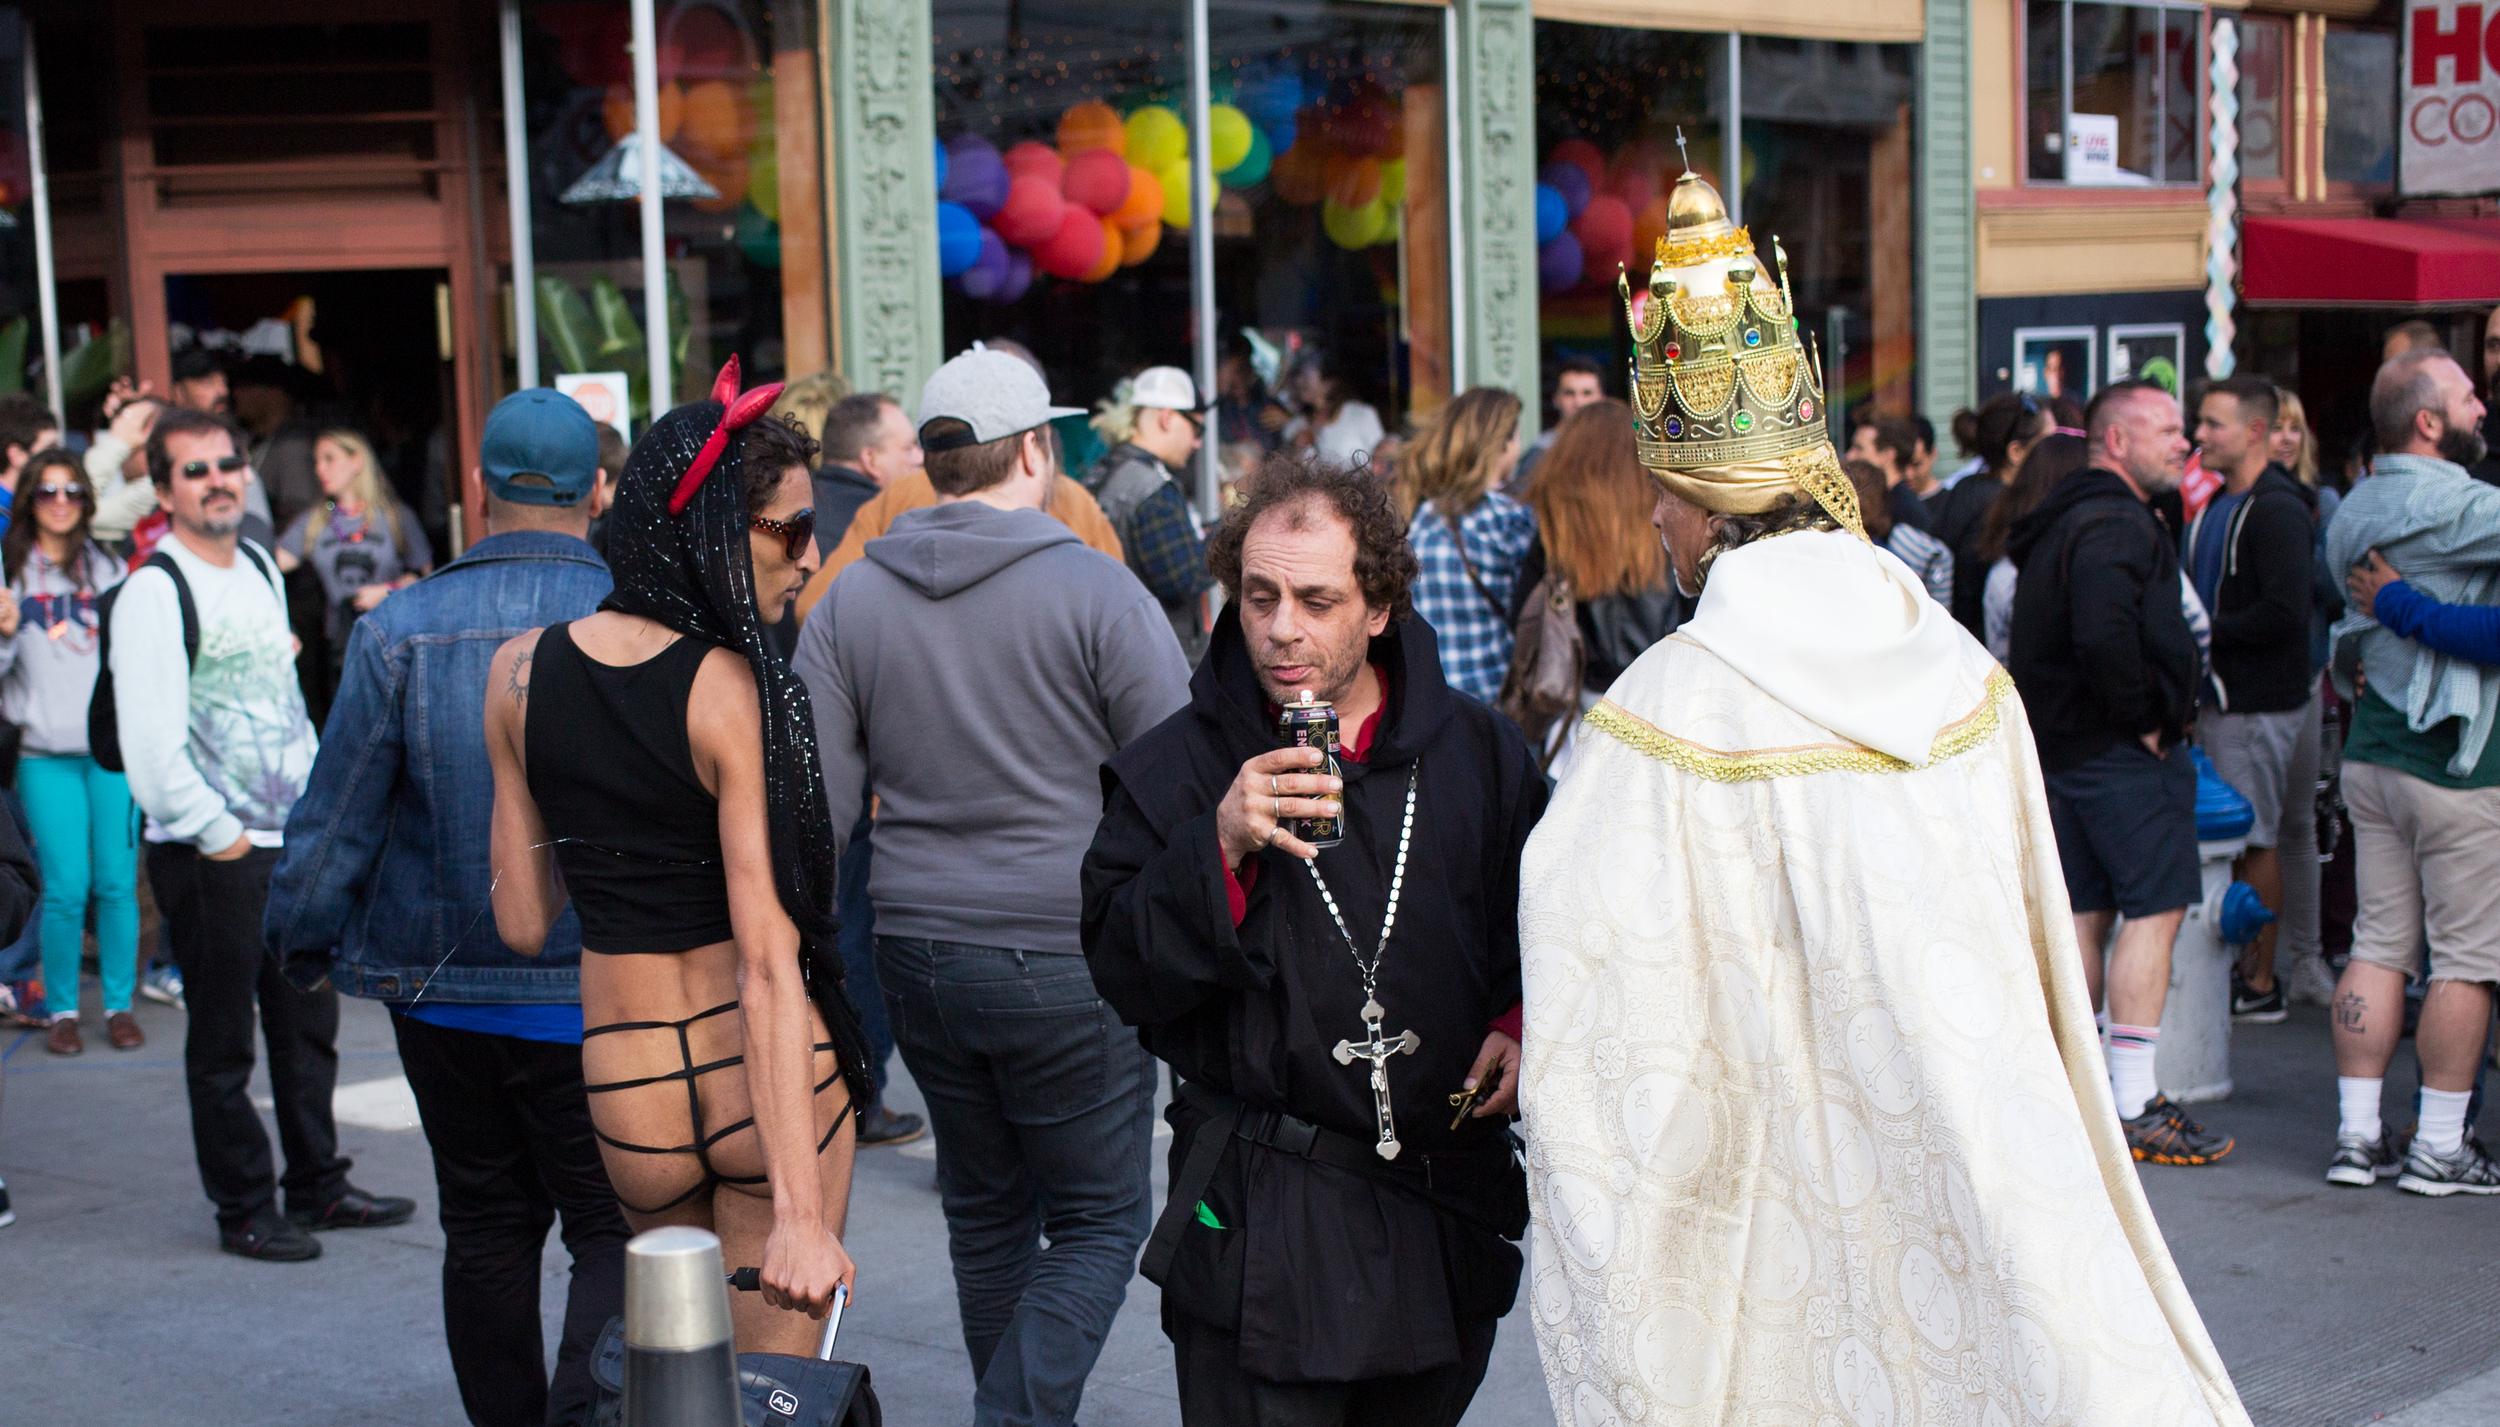 7854_cropped-Devil-Priest-Pope-.jpg